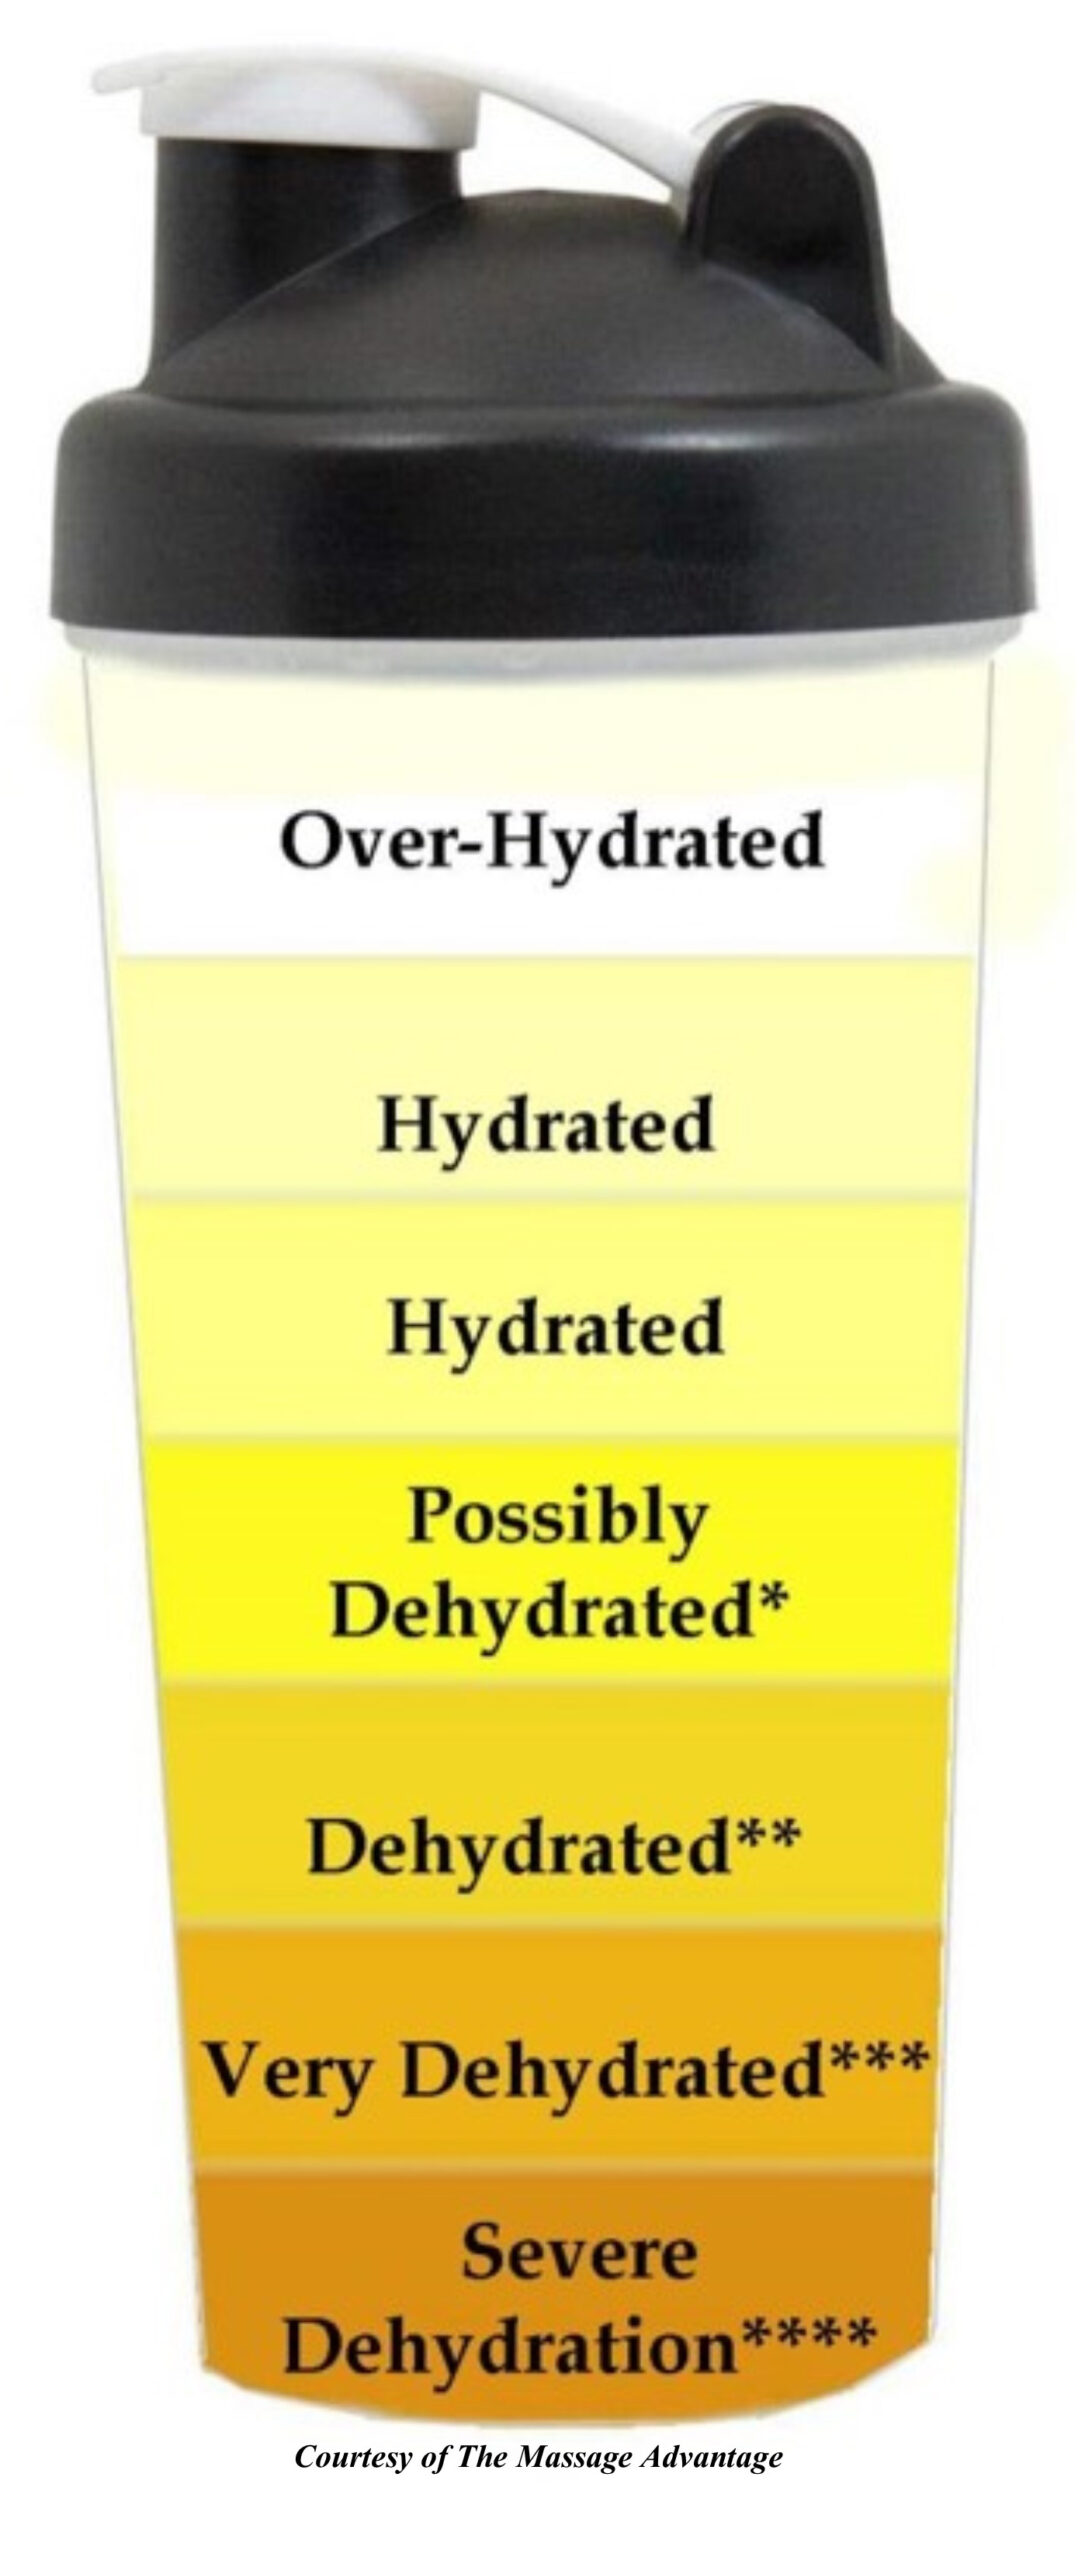 The Massage Advantage: Las Vegas, NV: Urine-Hydration